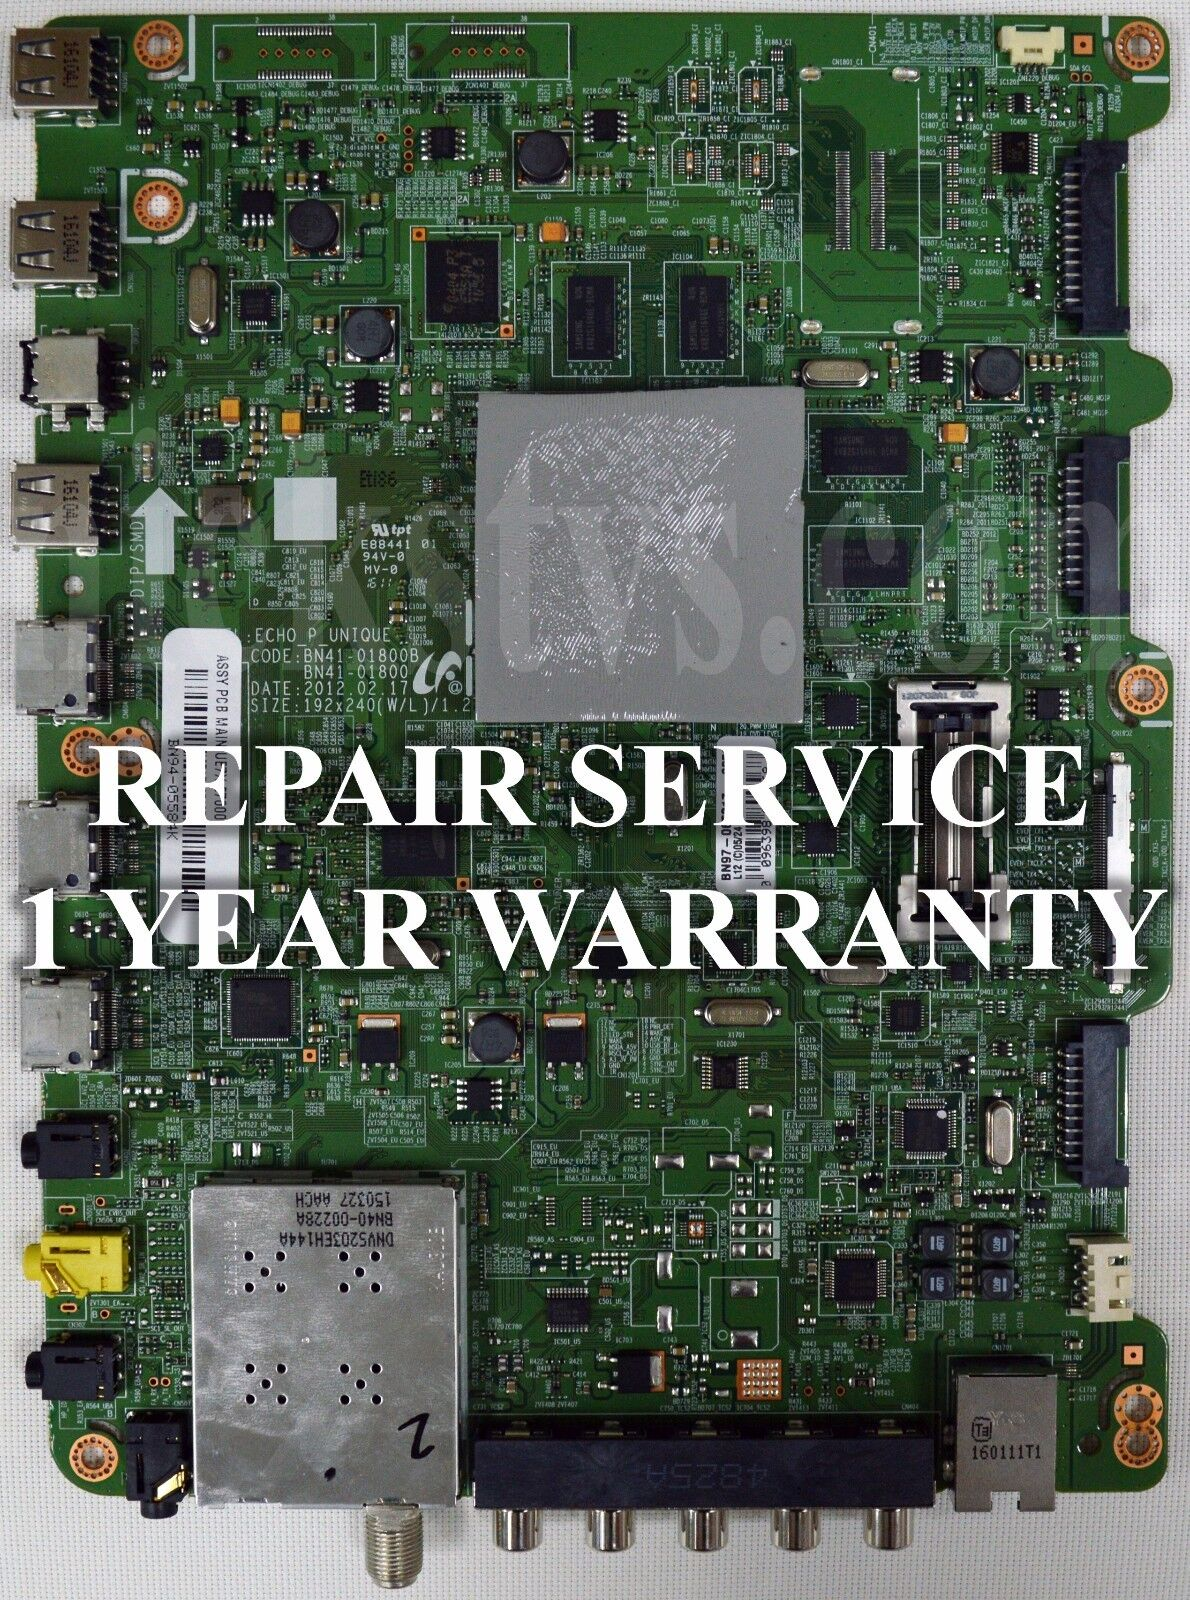 Mail-in Repair Service For Samsung UN60ES8000 Main Board 1 YEAR WARRANTY